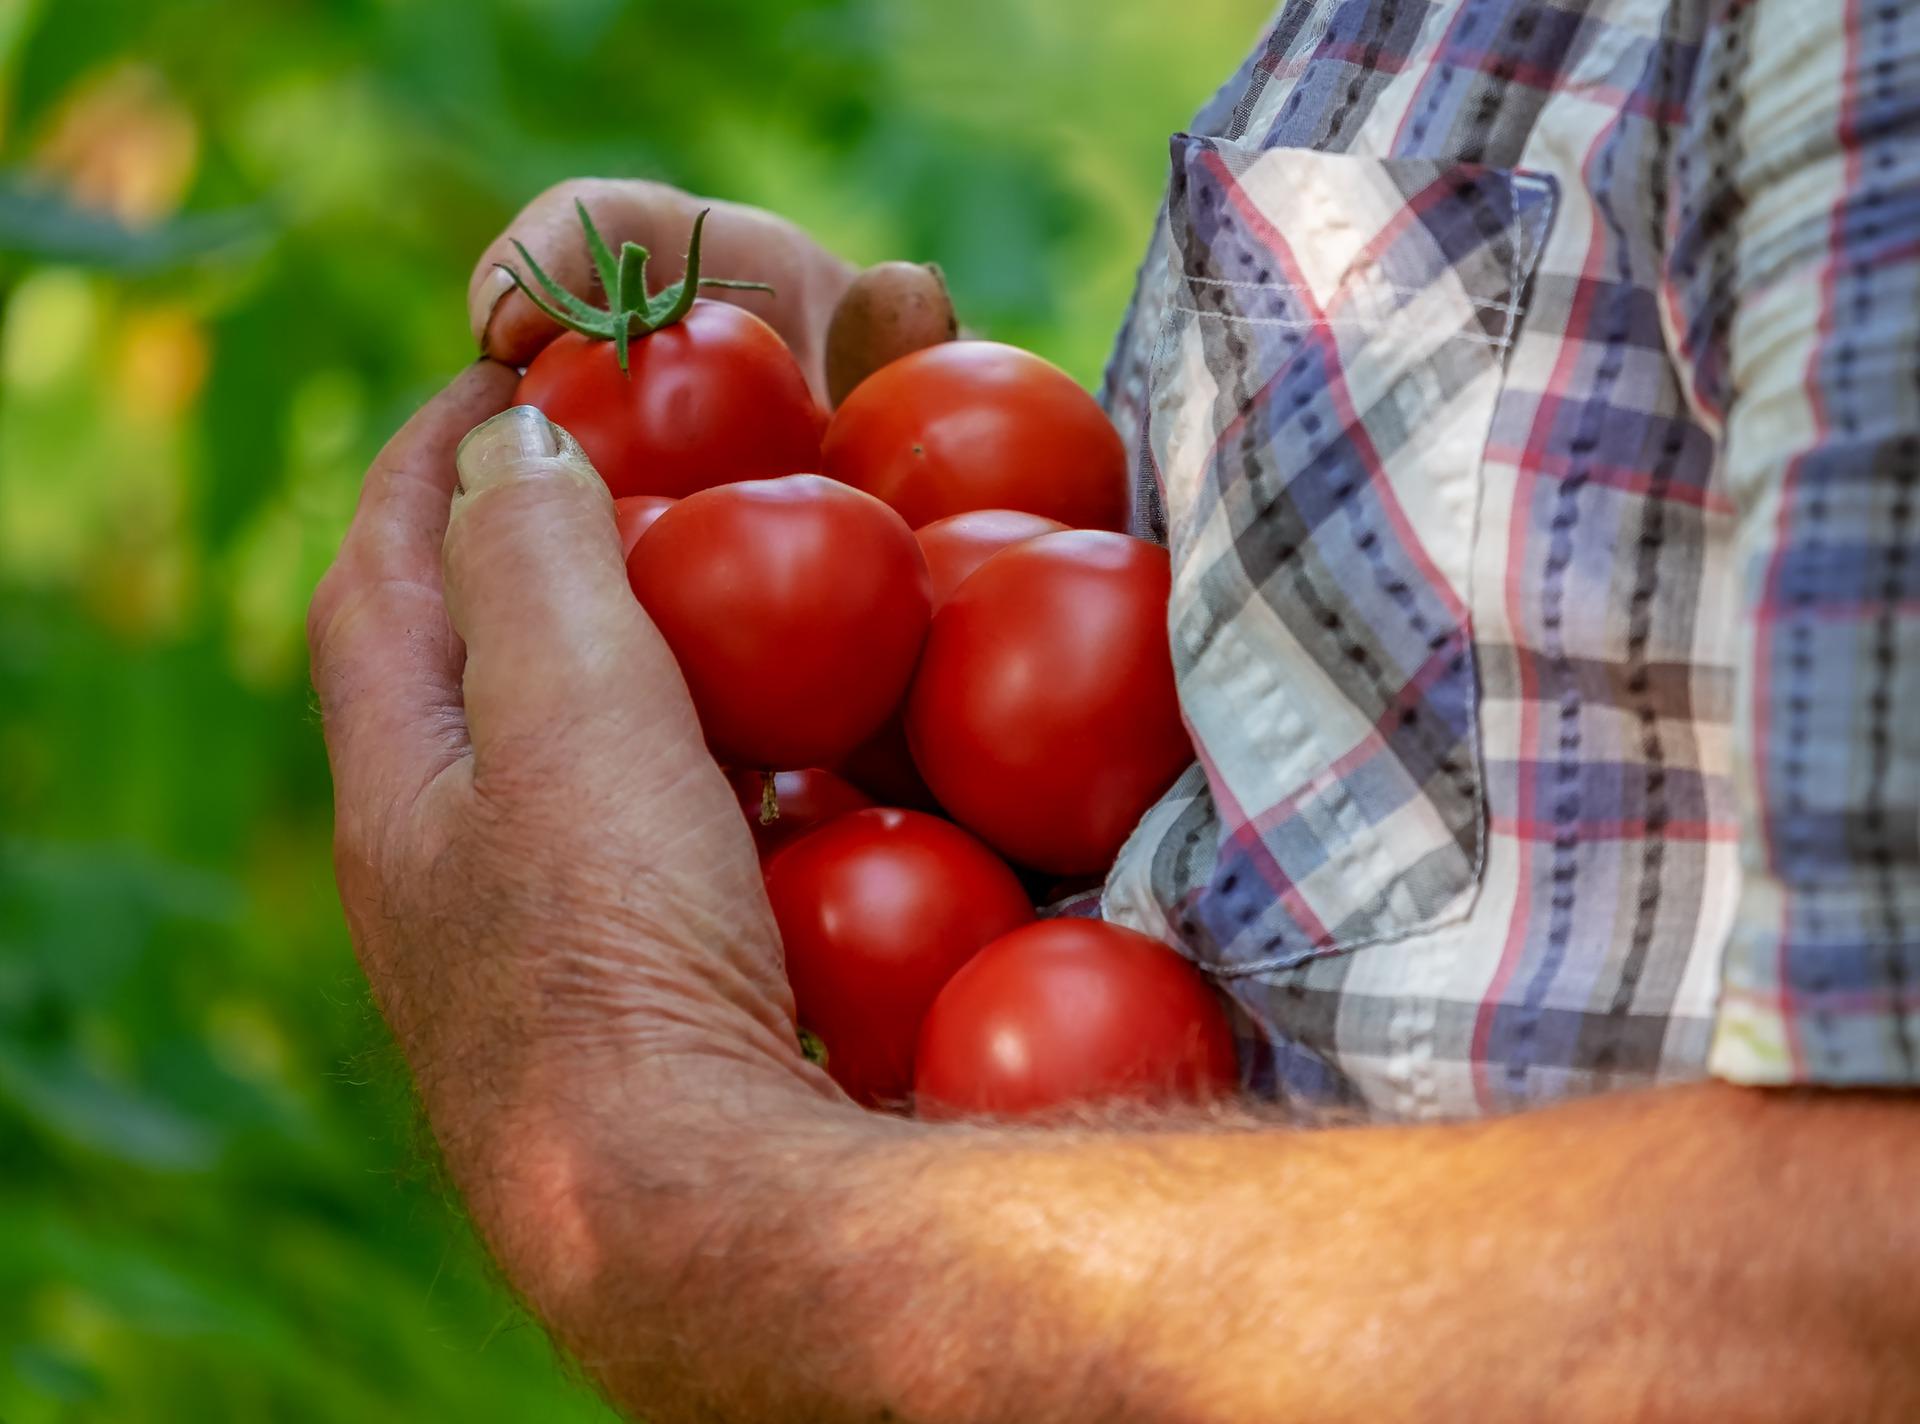 Zelenina jako prevence chorob